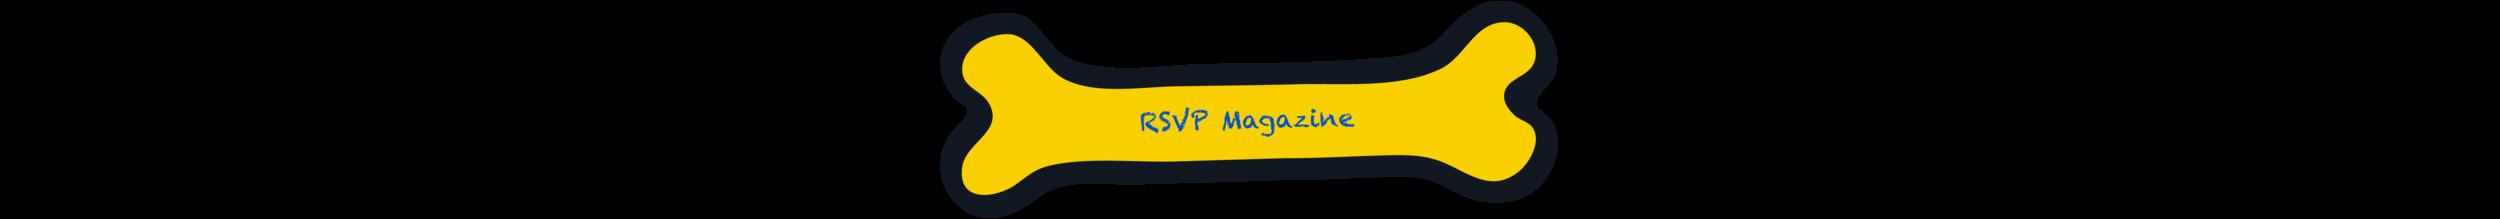 Press_RSVP.png